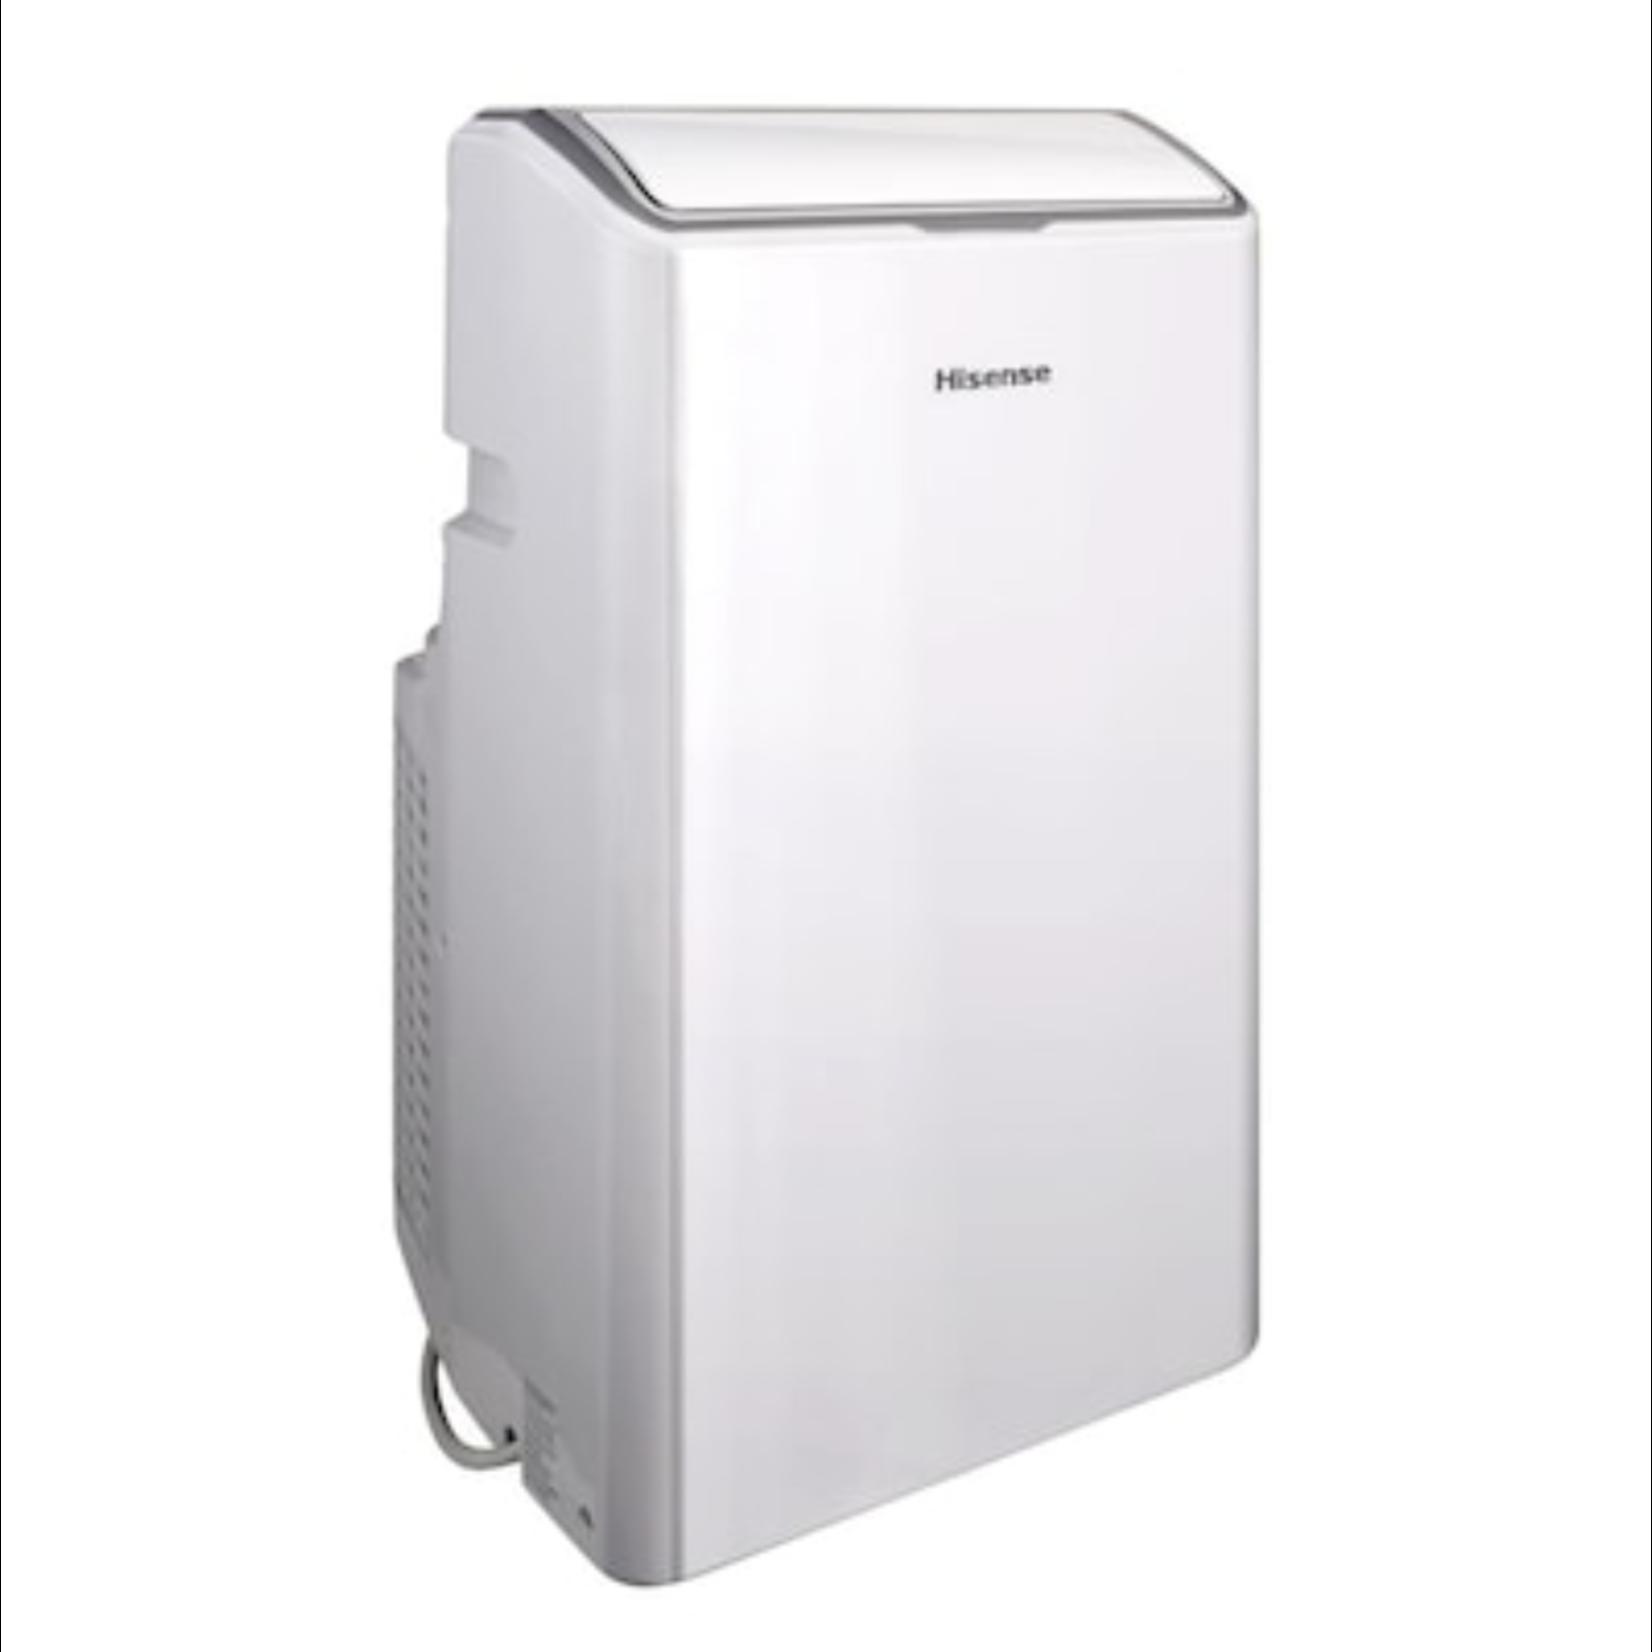 10608 Hisense White Portable Air Conditioner